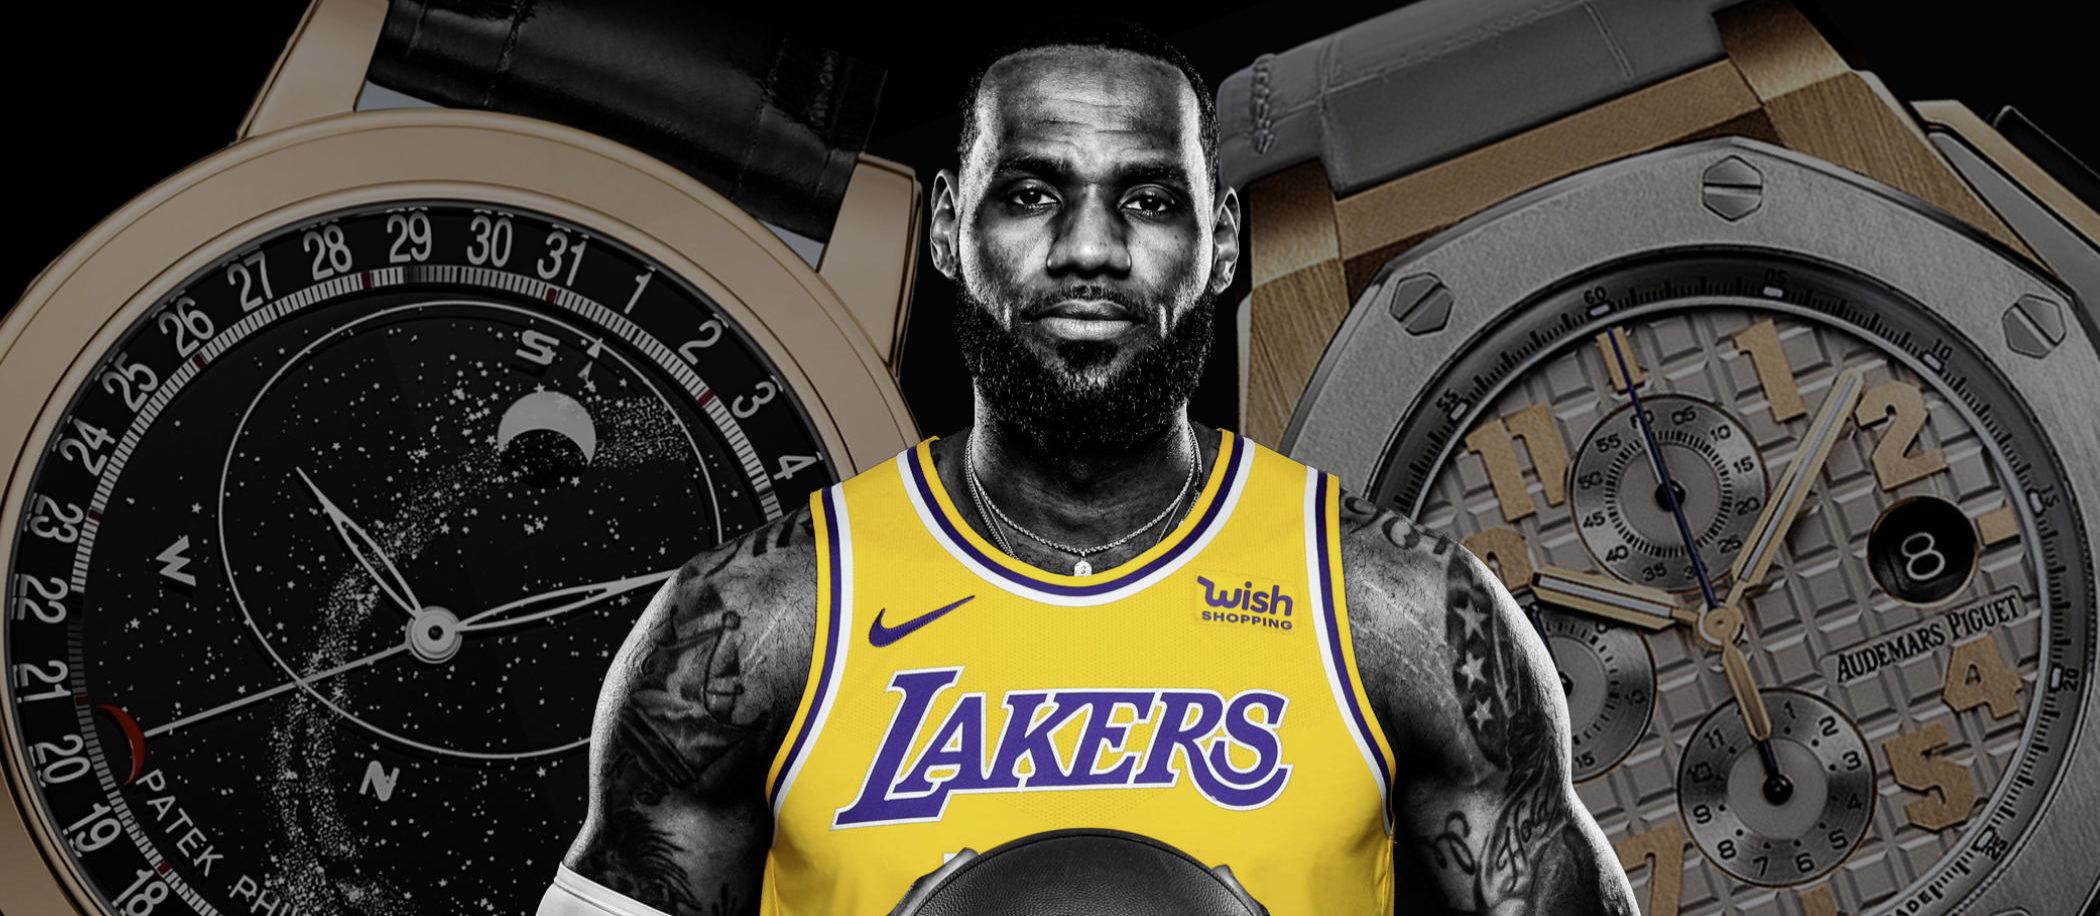 Zegarki gwiazd NBA - LeBron James / foto: nba.com